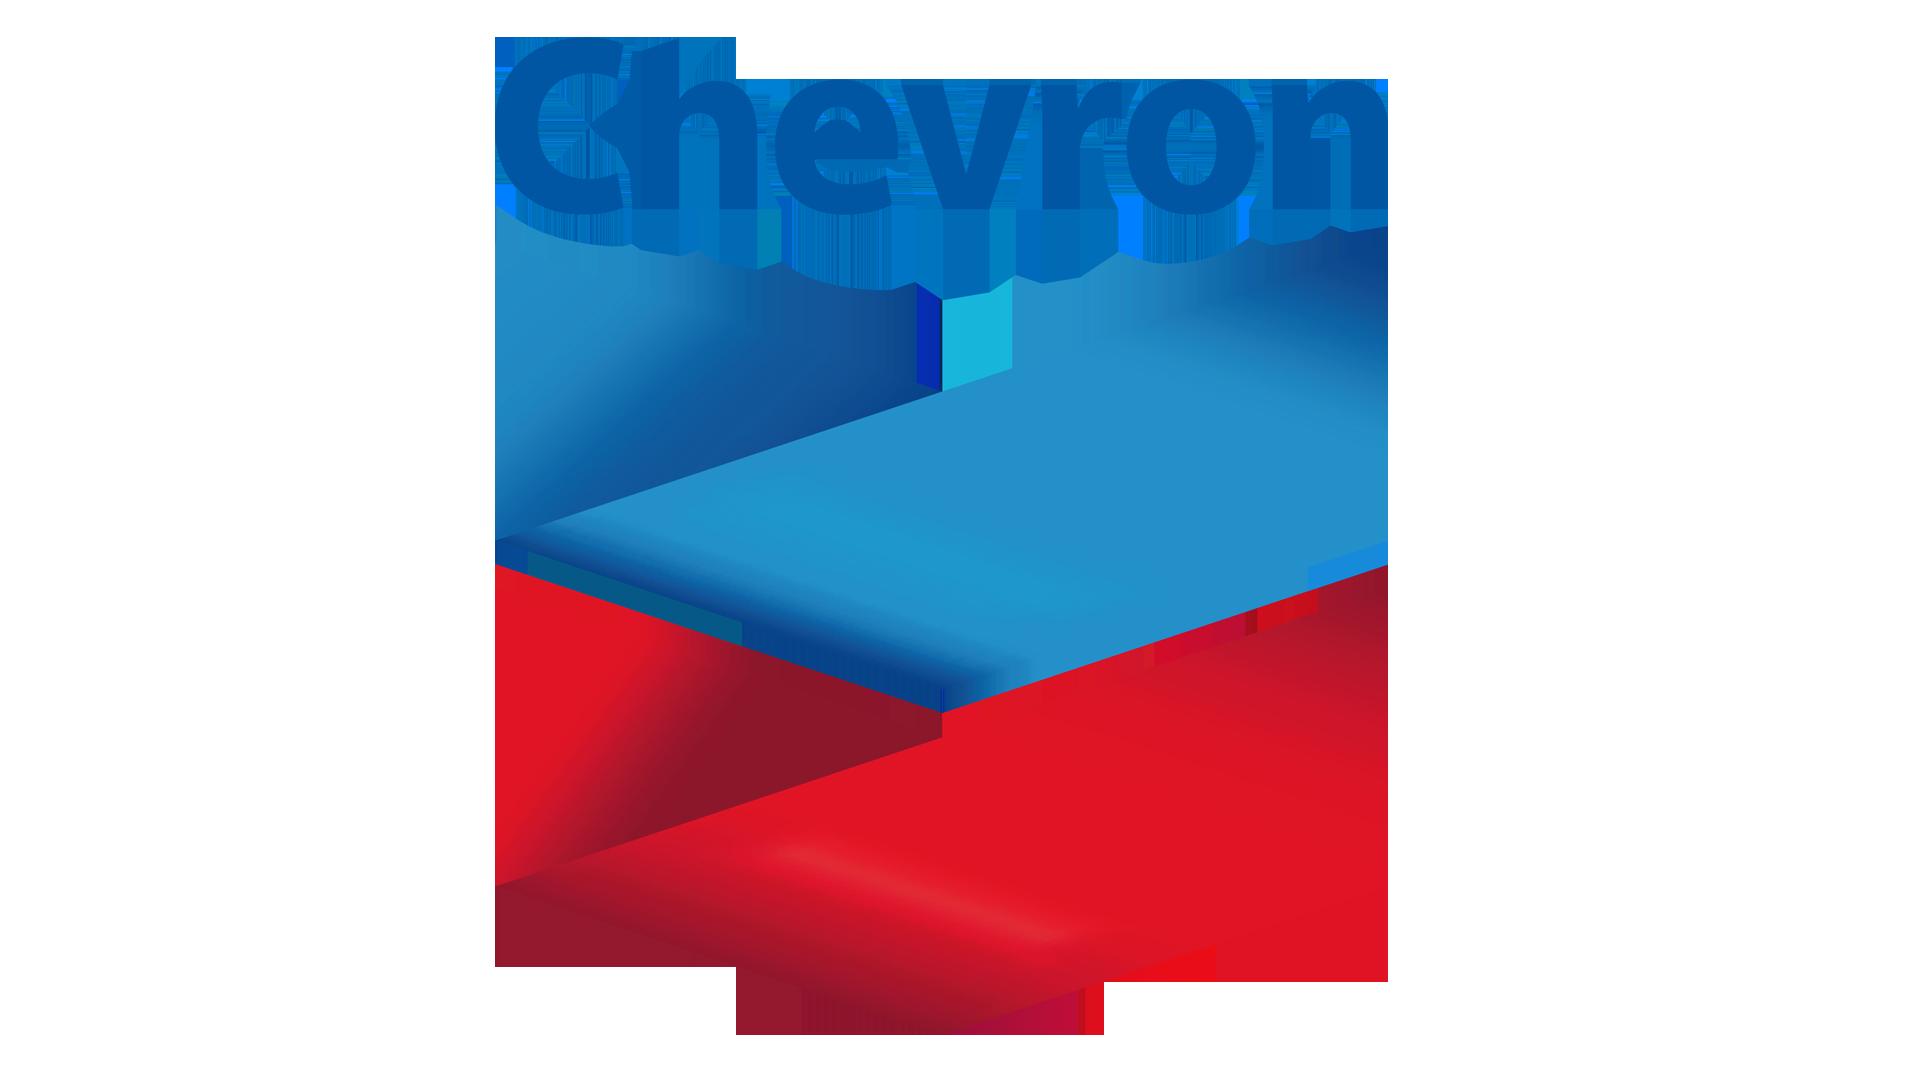 Car Brand Name With Logo >> Chevron Logo, Chevron Symbol, Meaning, History and Evolution